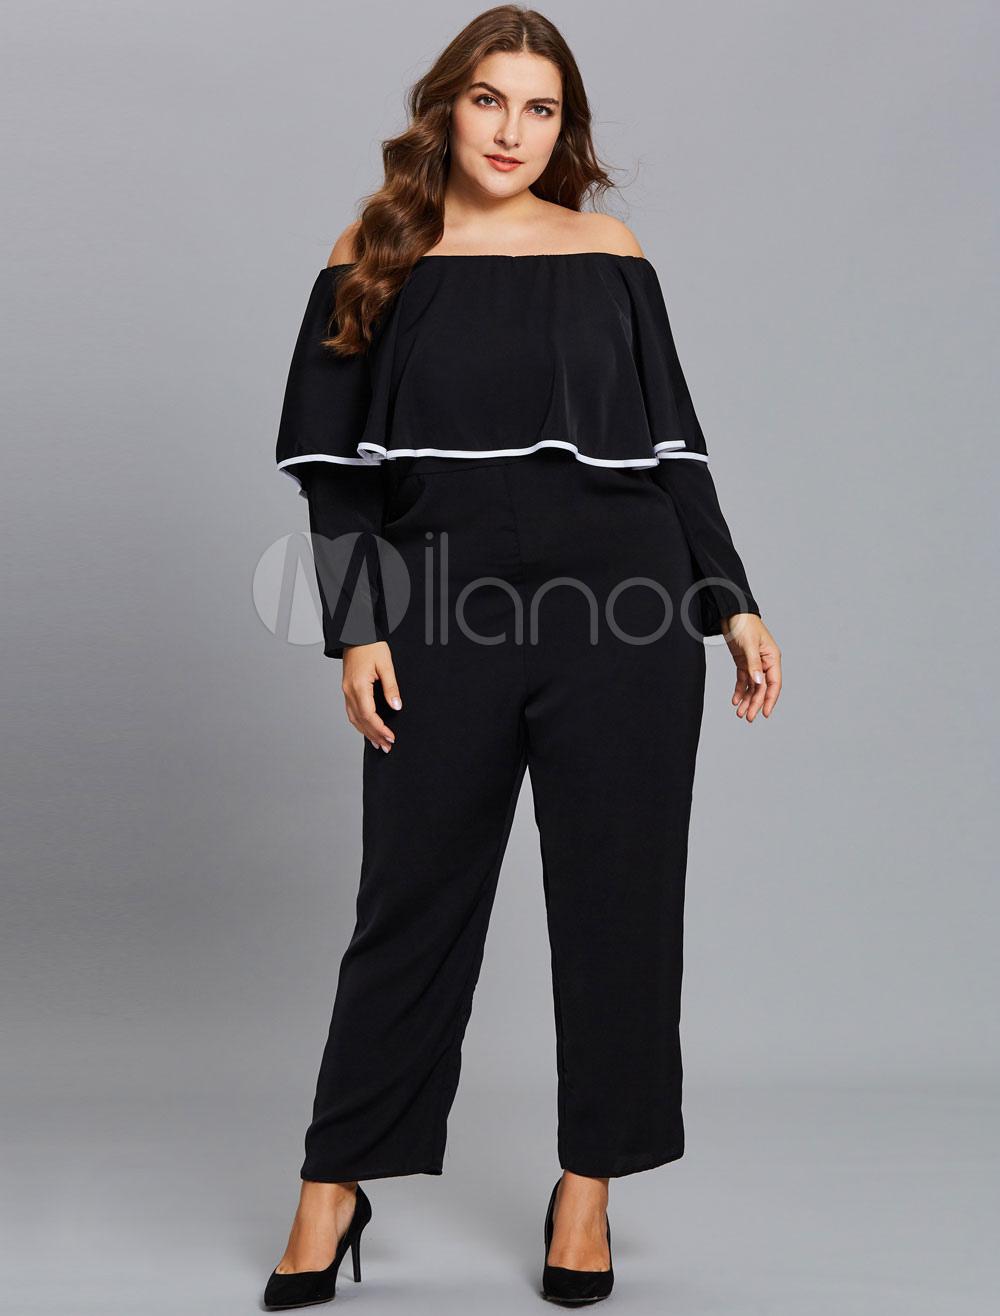 cda0b2e91ad Black Plus Size Jumpsuit Off The Shoulder Long Sleeve Ruffles ...